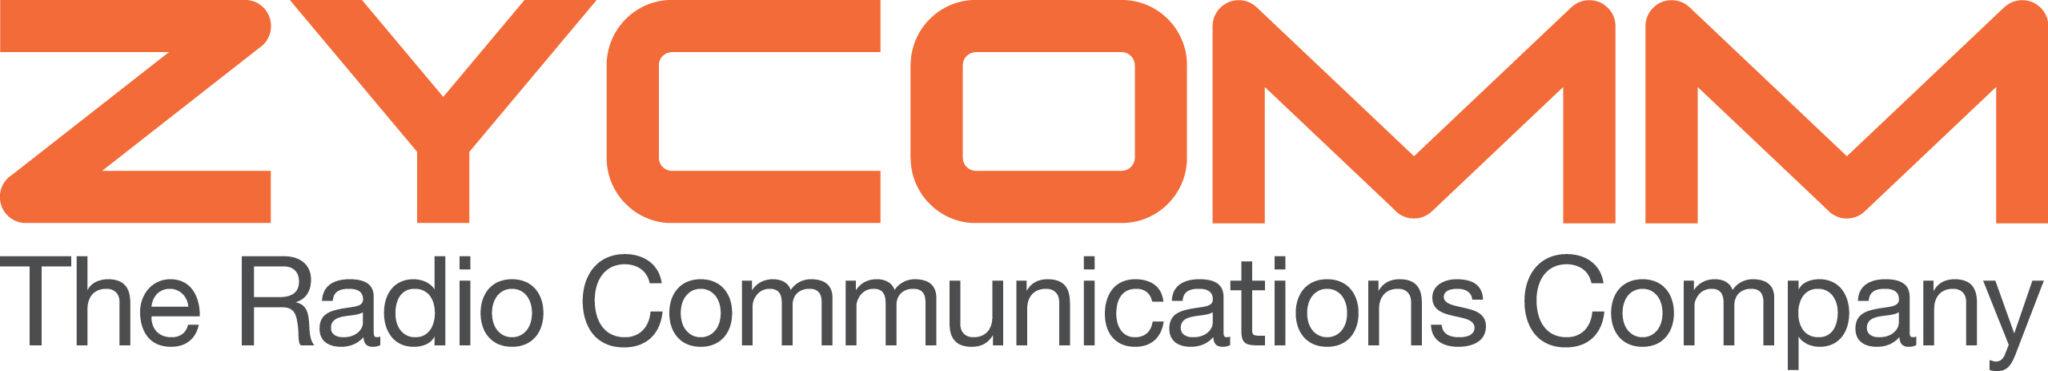 zycomm logo